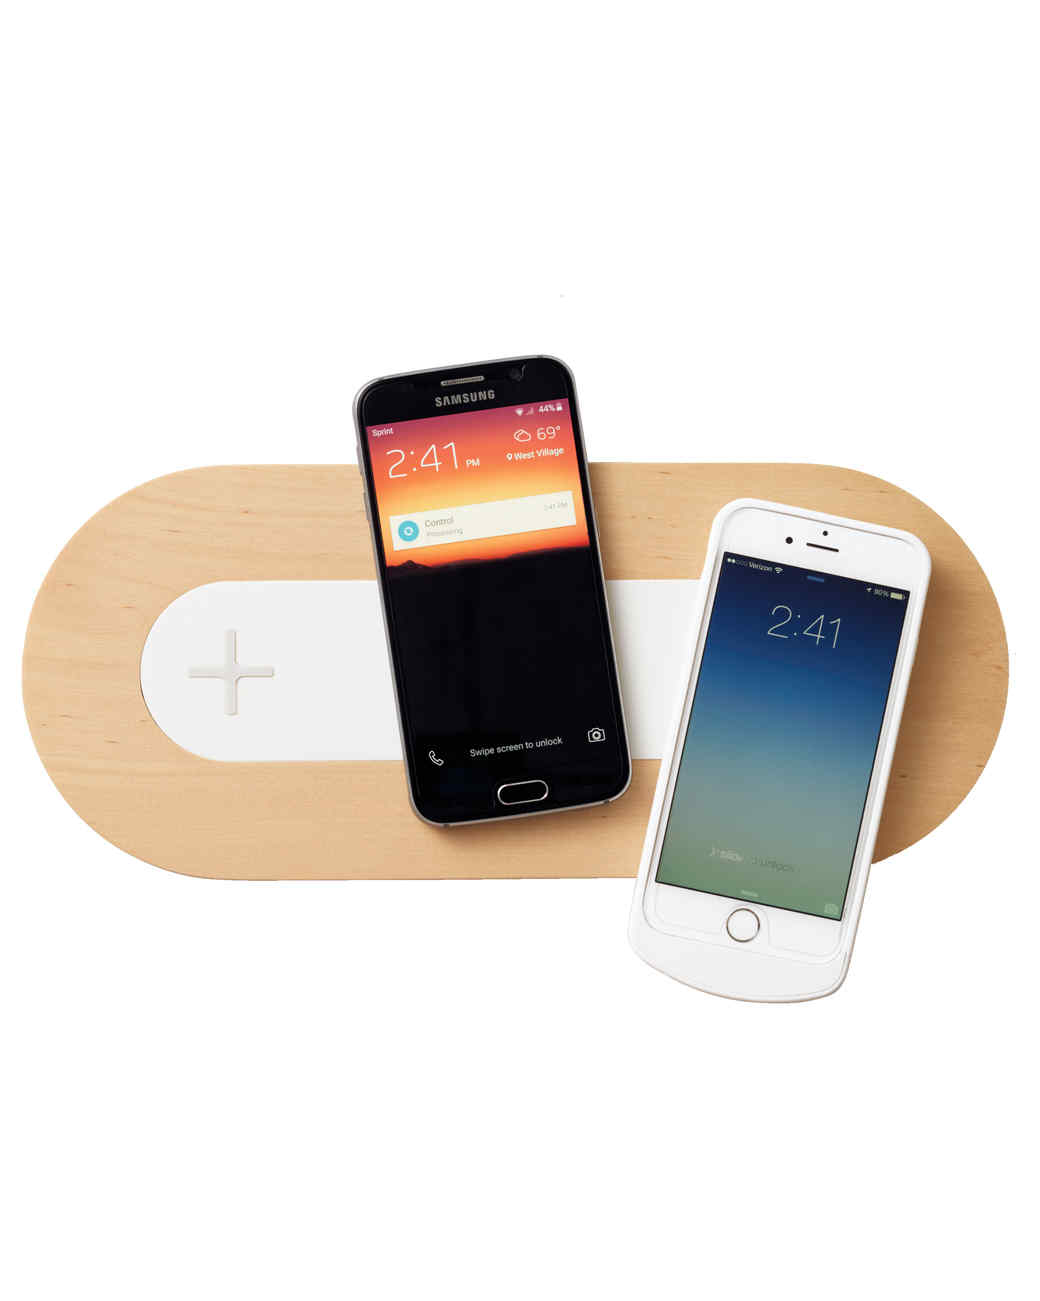 ikea-charging-pad-194-d112264.jpg